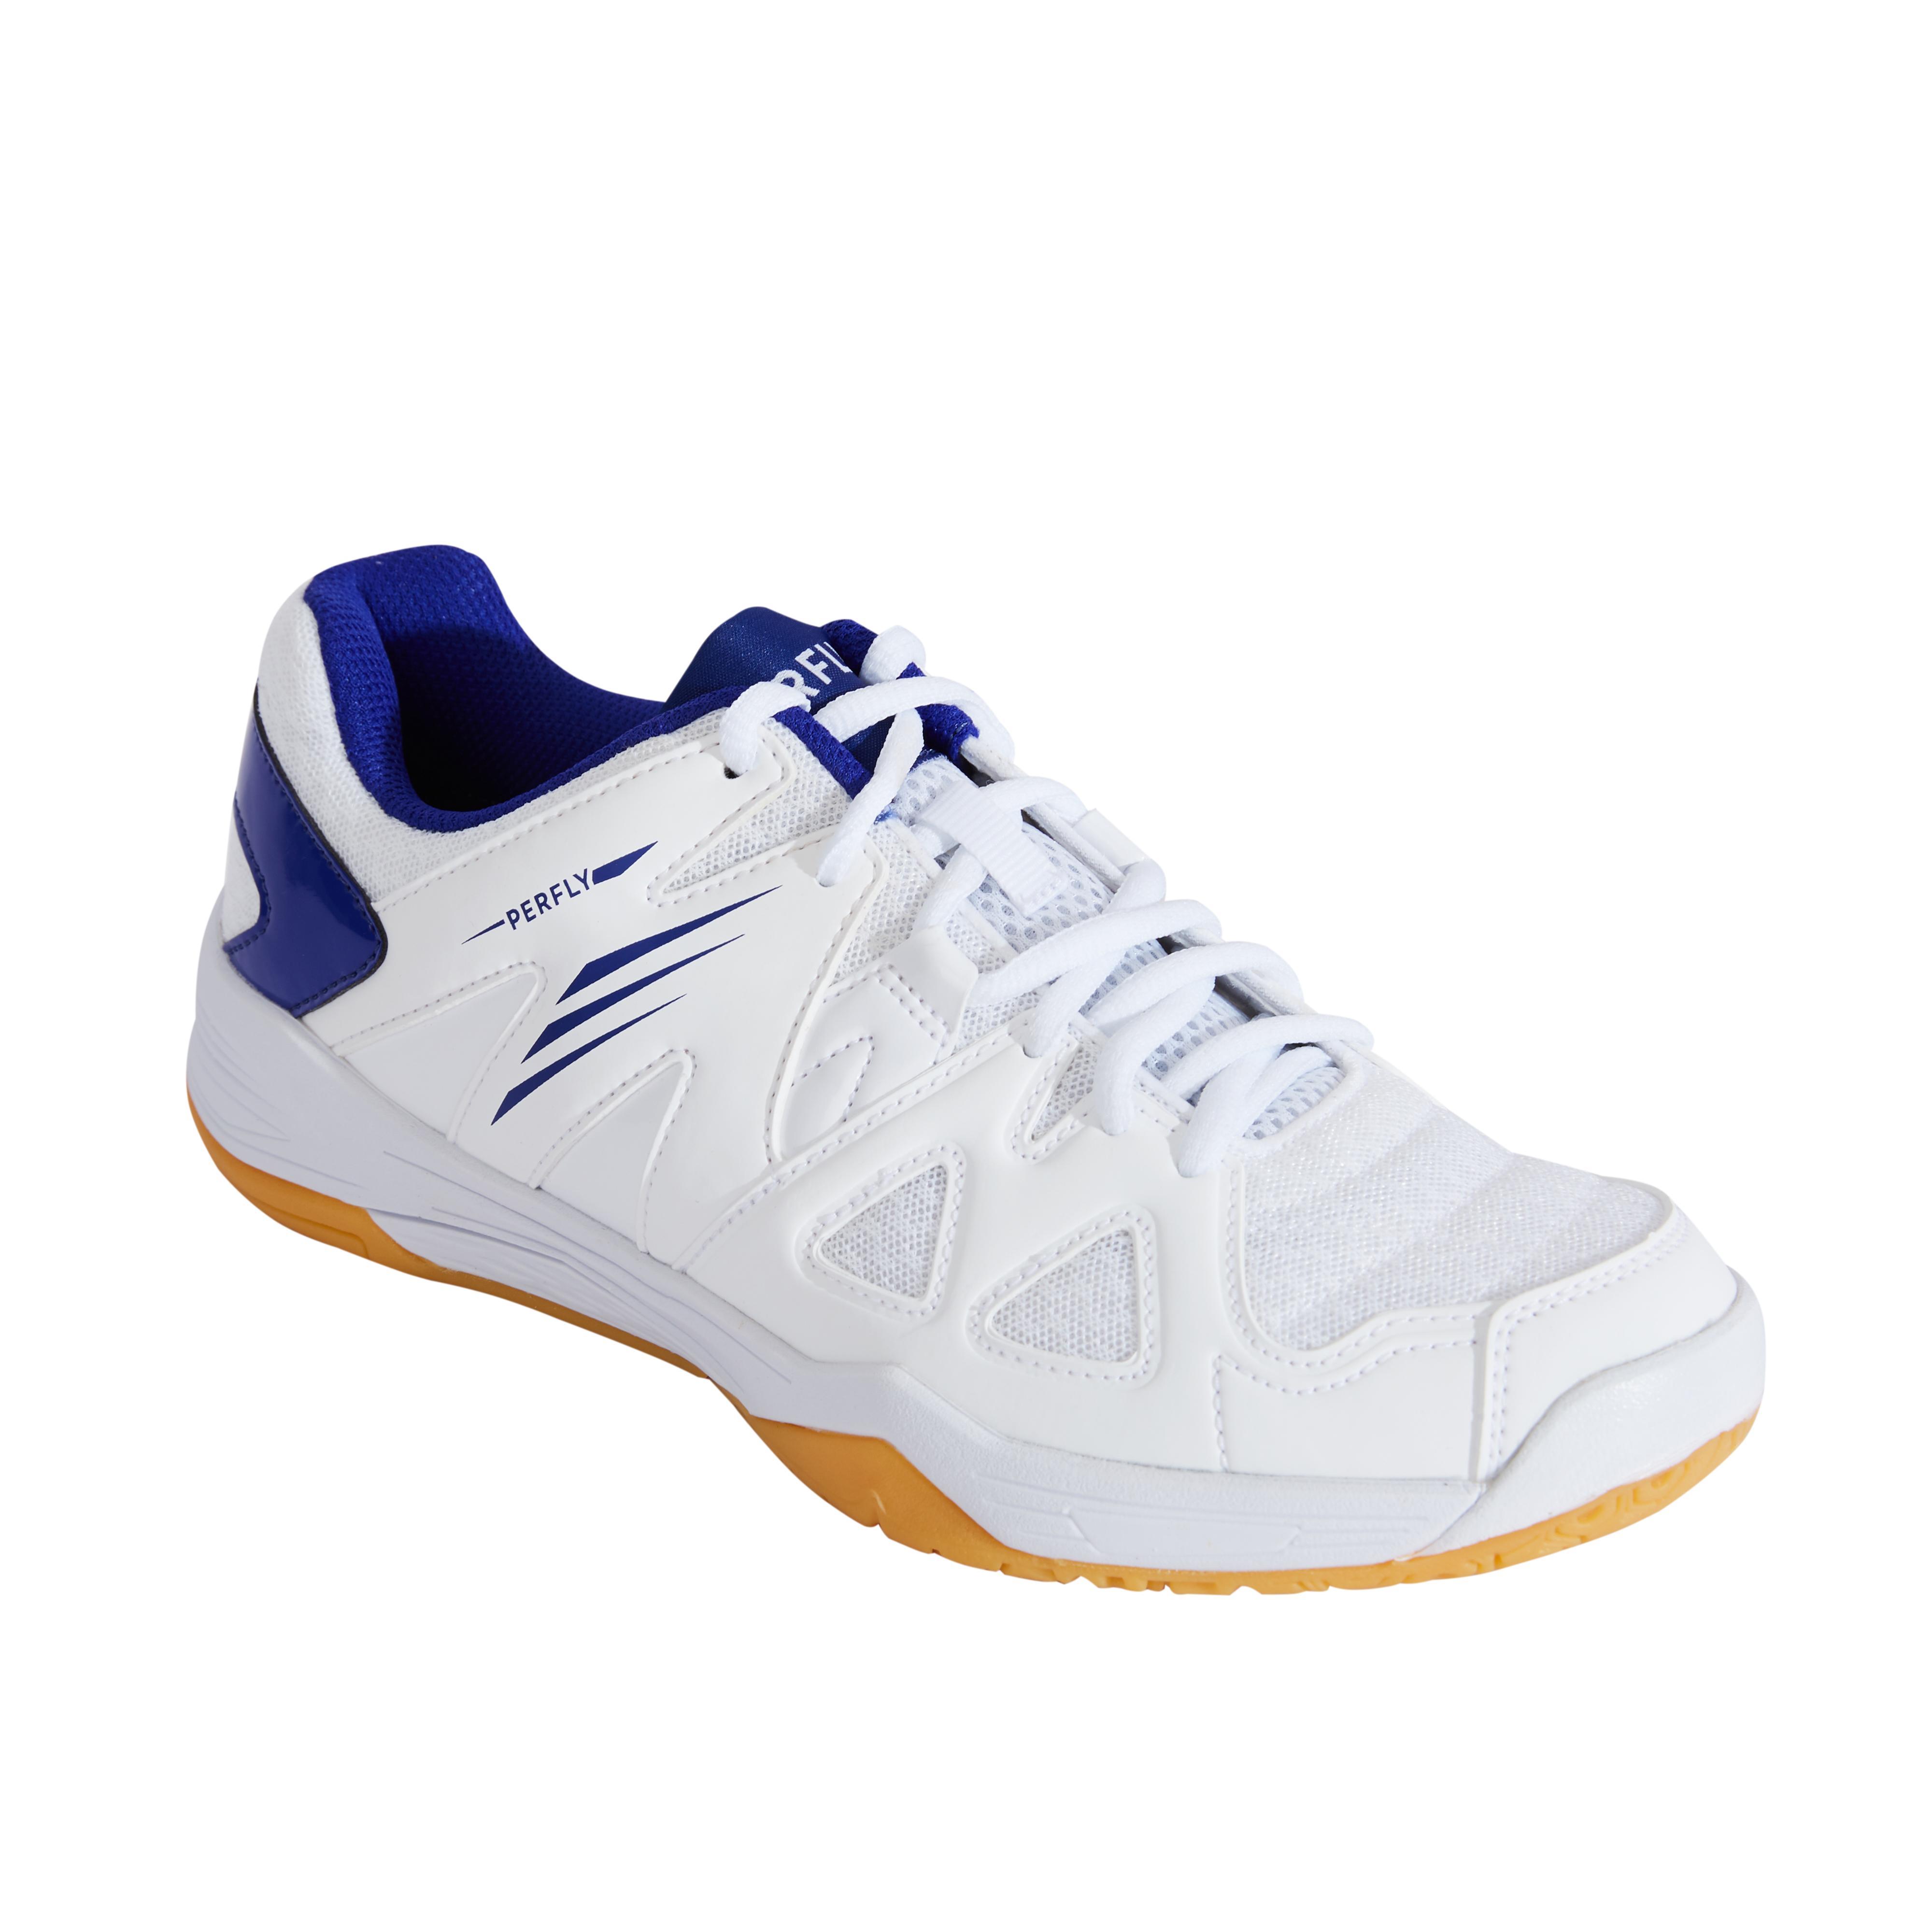 PERFLY Chaussures De Badminton Femme BS530 - Blanc/Bleu - PERFLY - 42